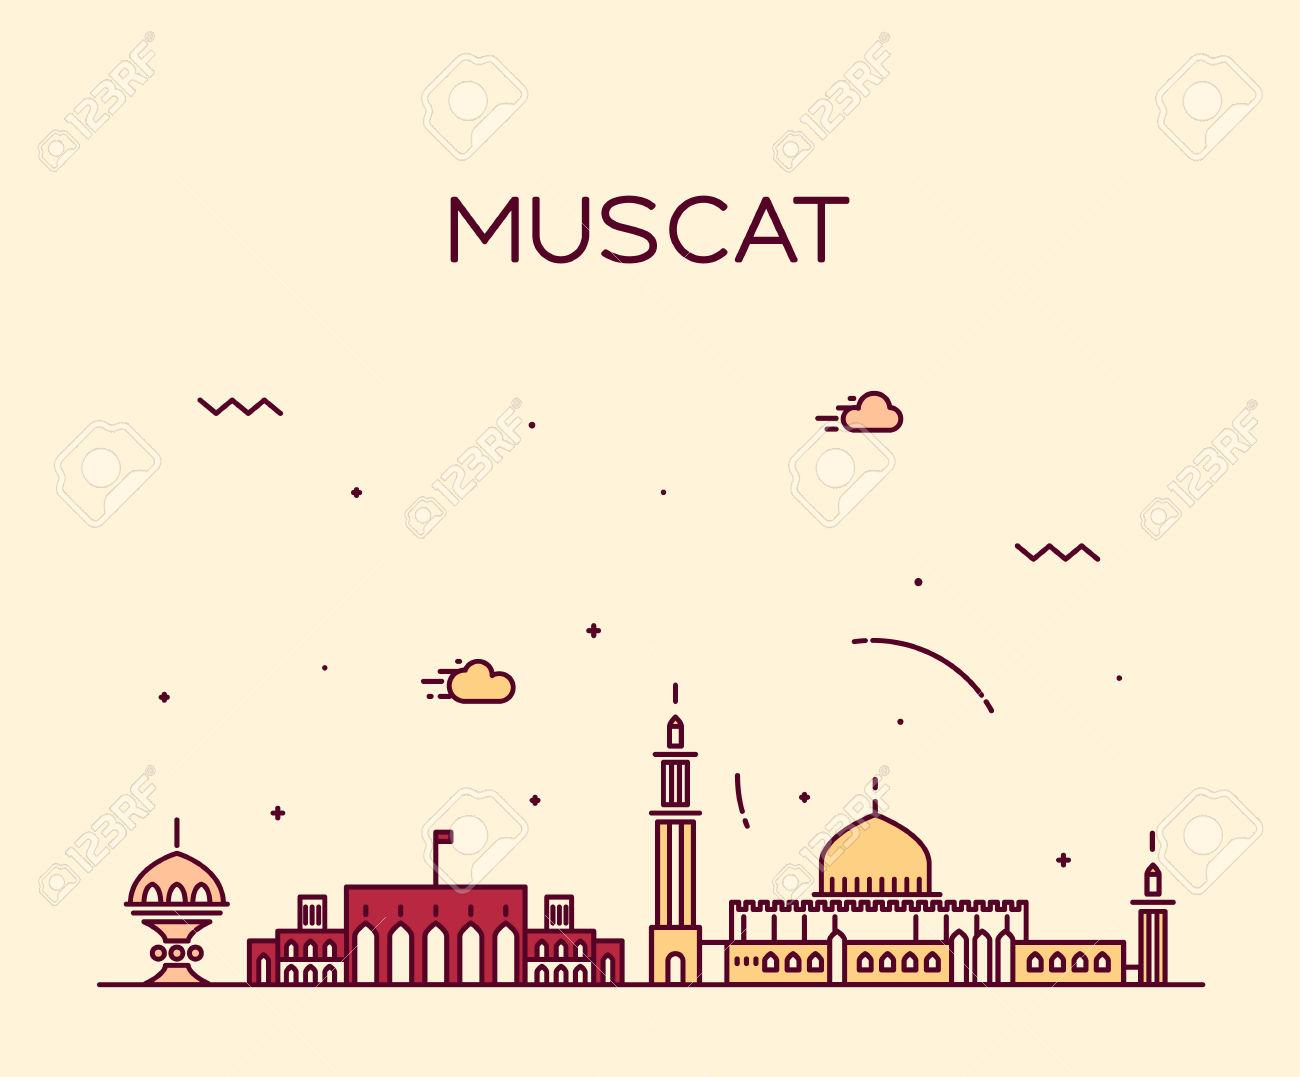 Muscat Skyline Detailed Silhouette Trendy Vector Illustration.